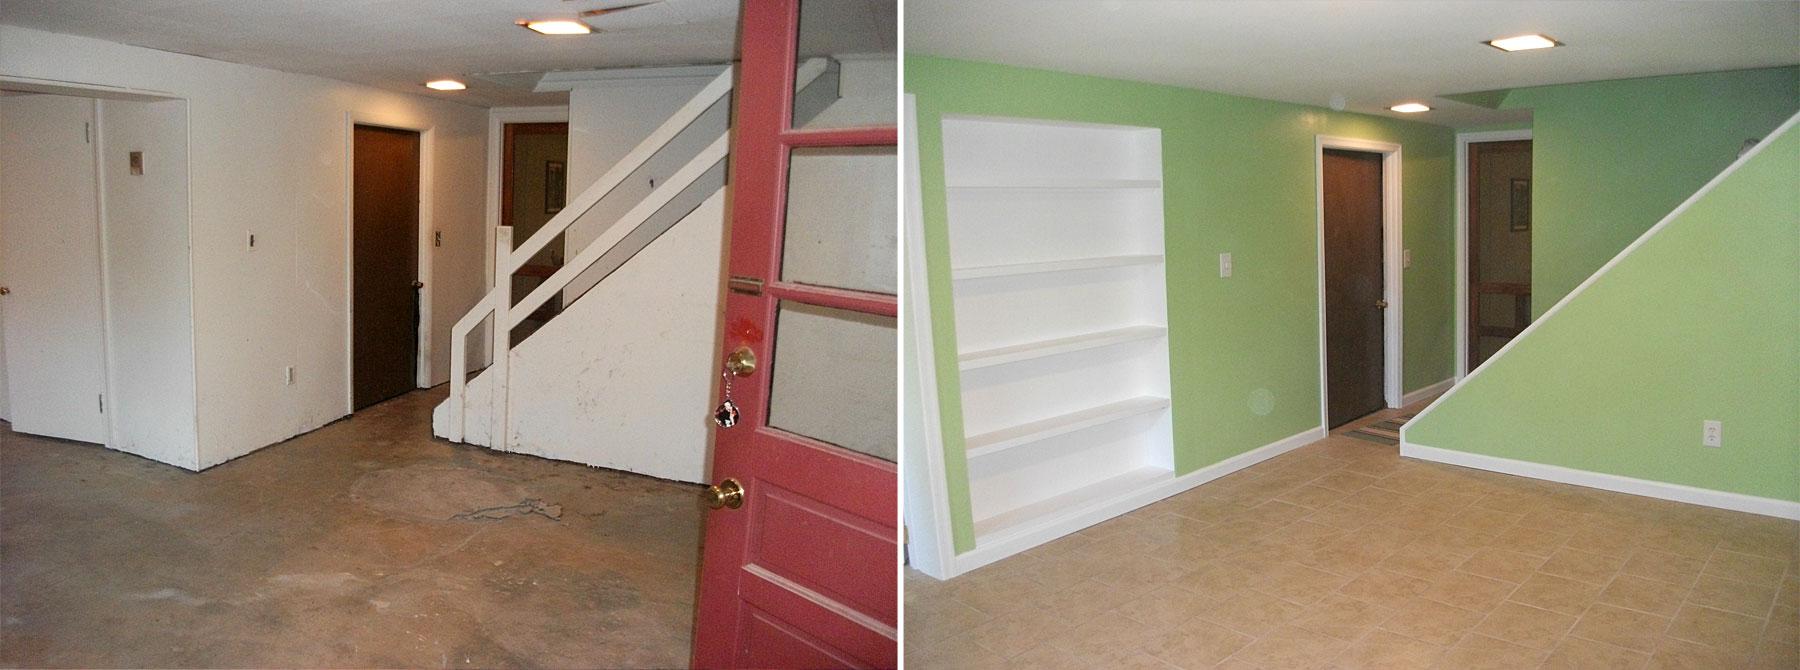 Basement Remodel Before & After